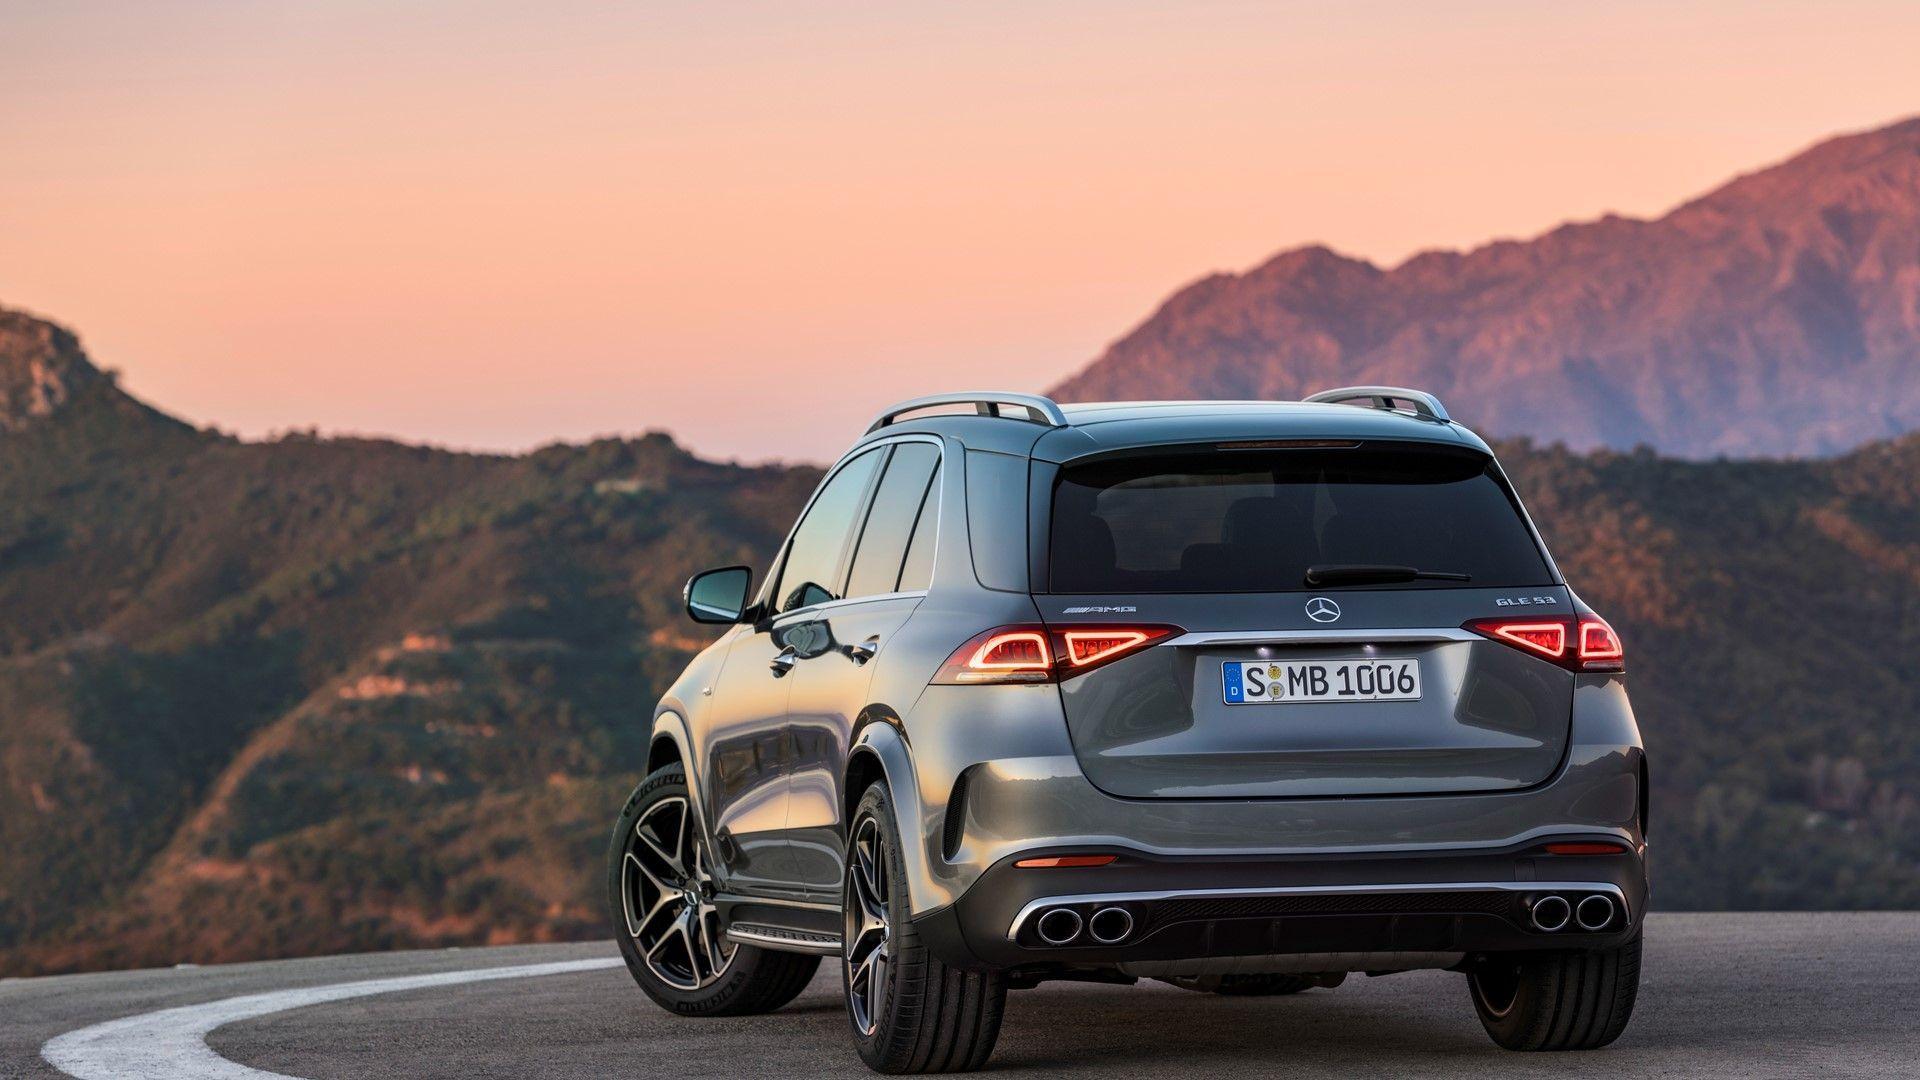 Luxury Used Acura Mdx in 2020 Mercedes benz australia